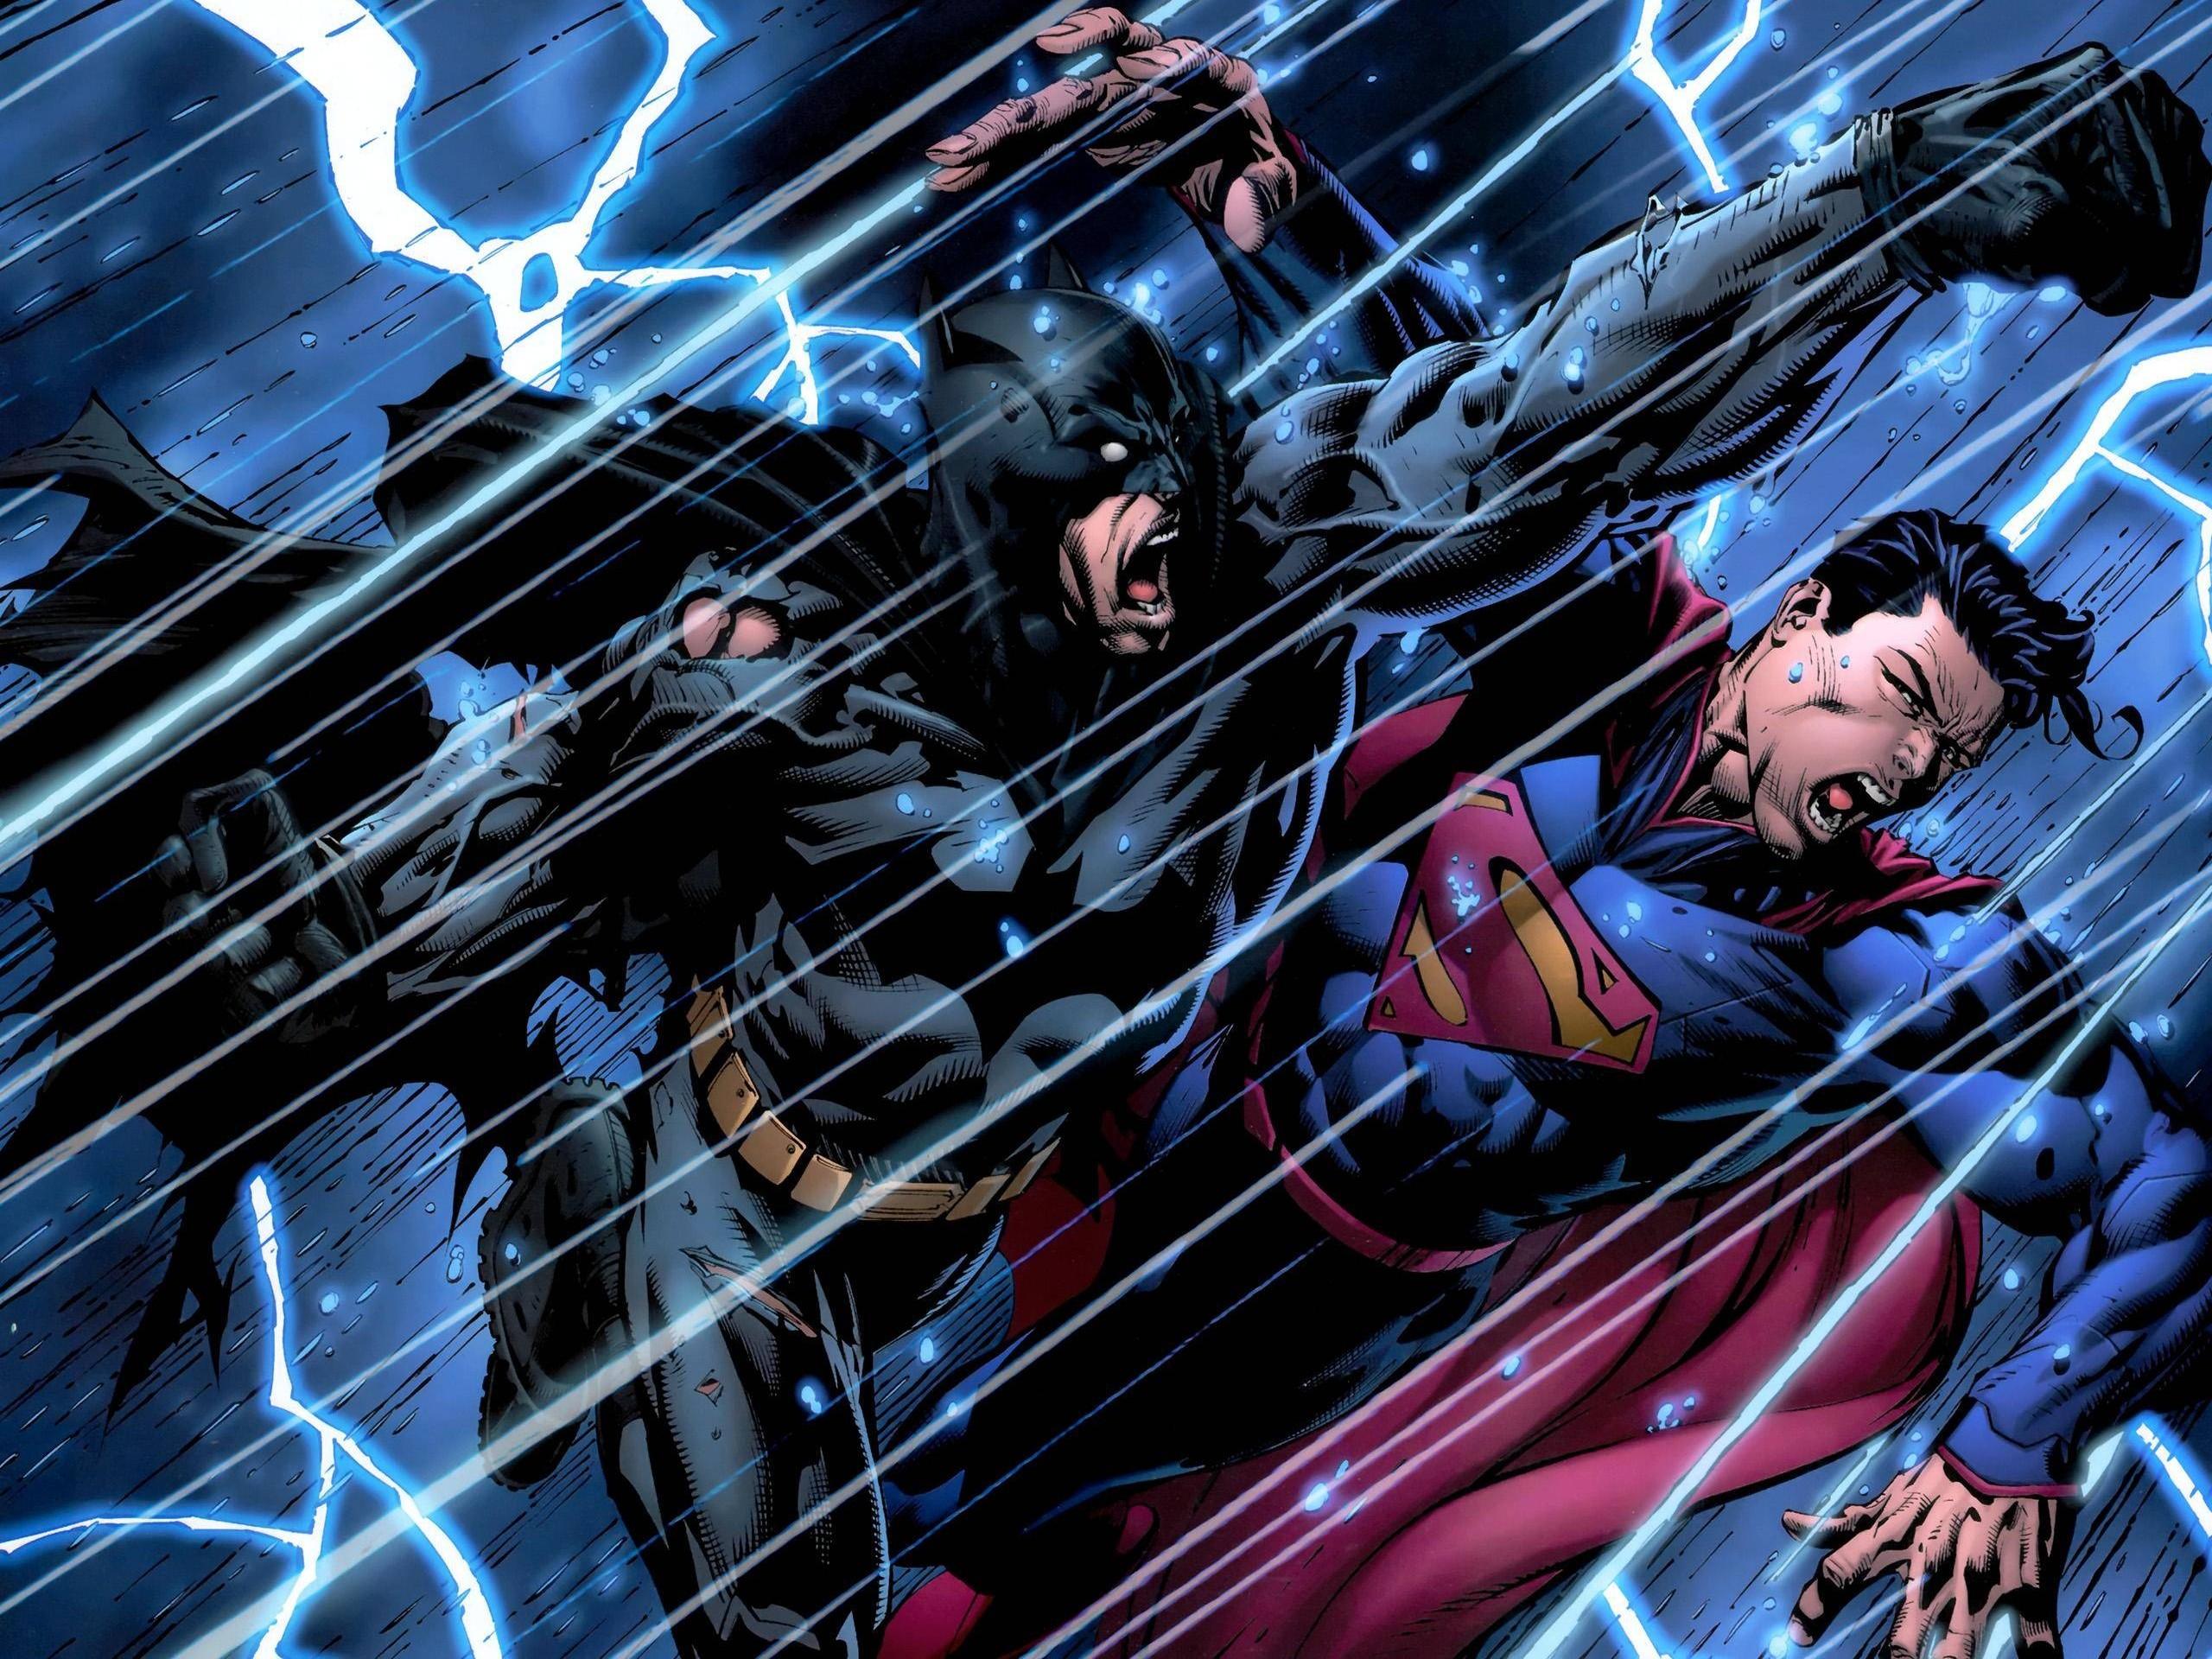 15 Batman: The Dark Knight HD Wallpapers   Backgrounds – Wallpaper Abyss